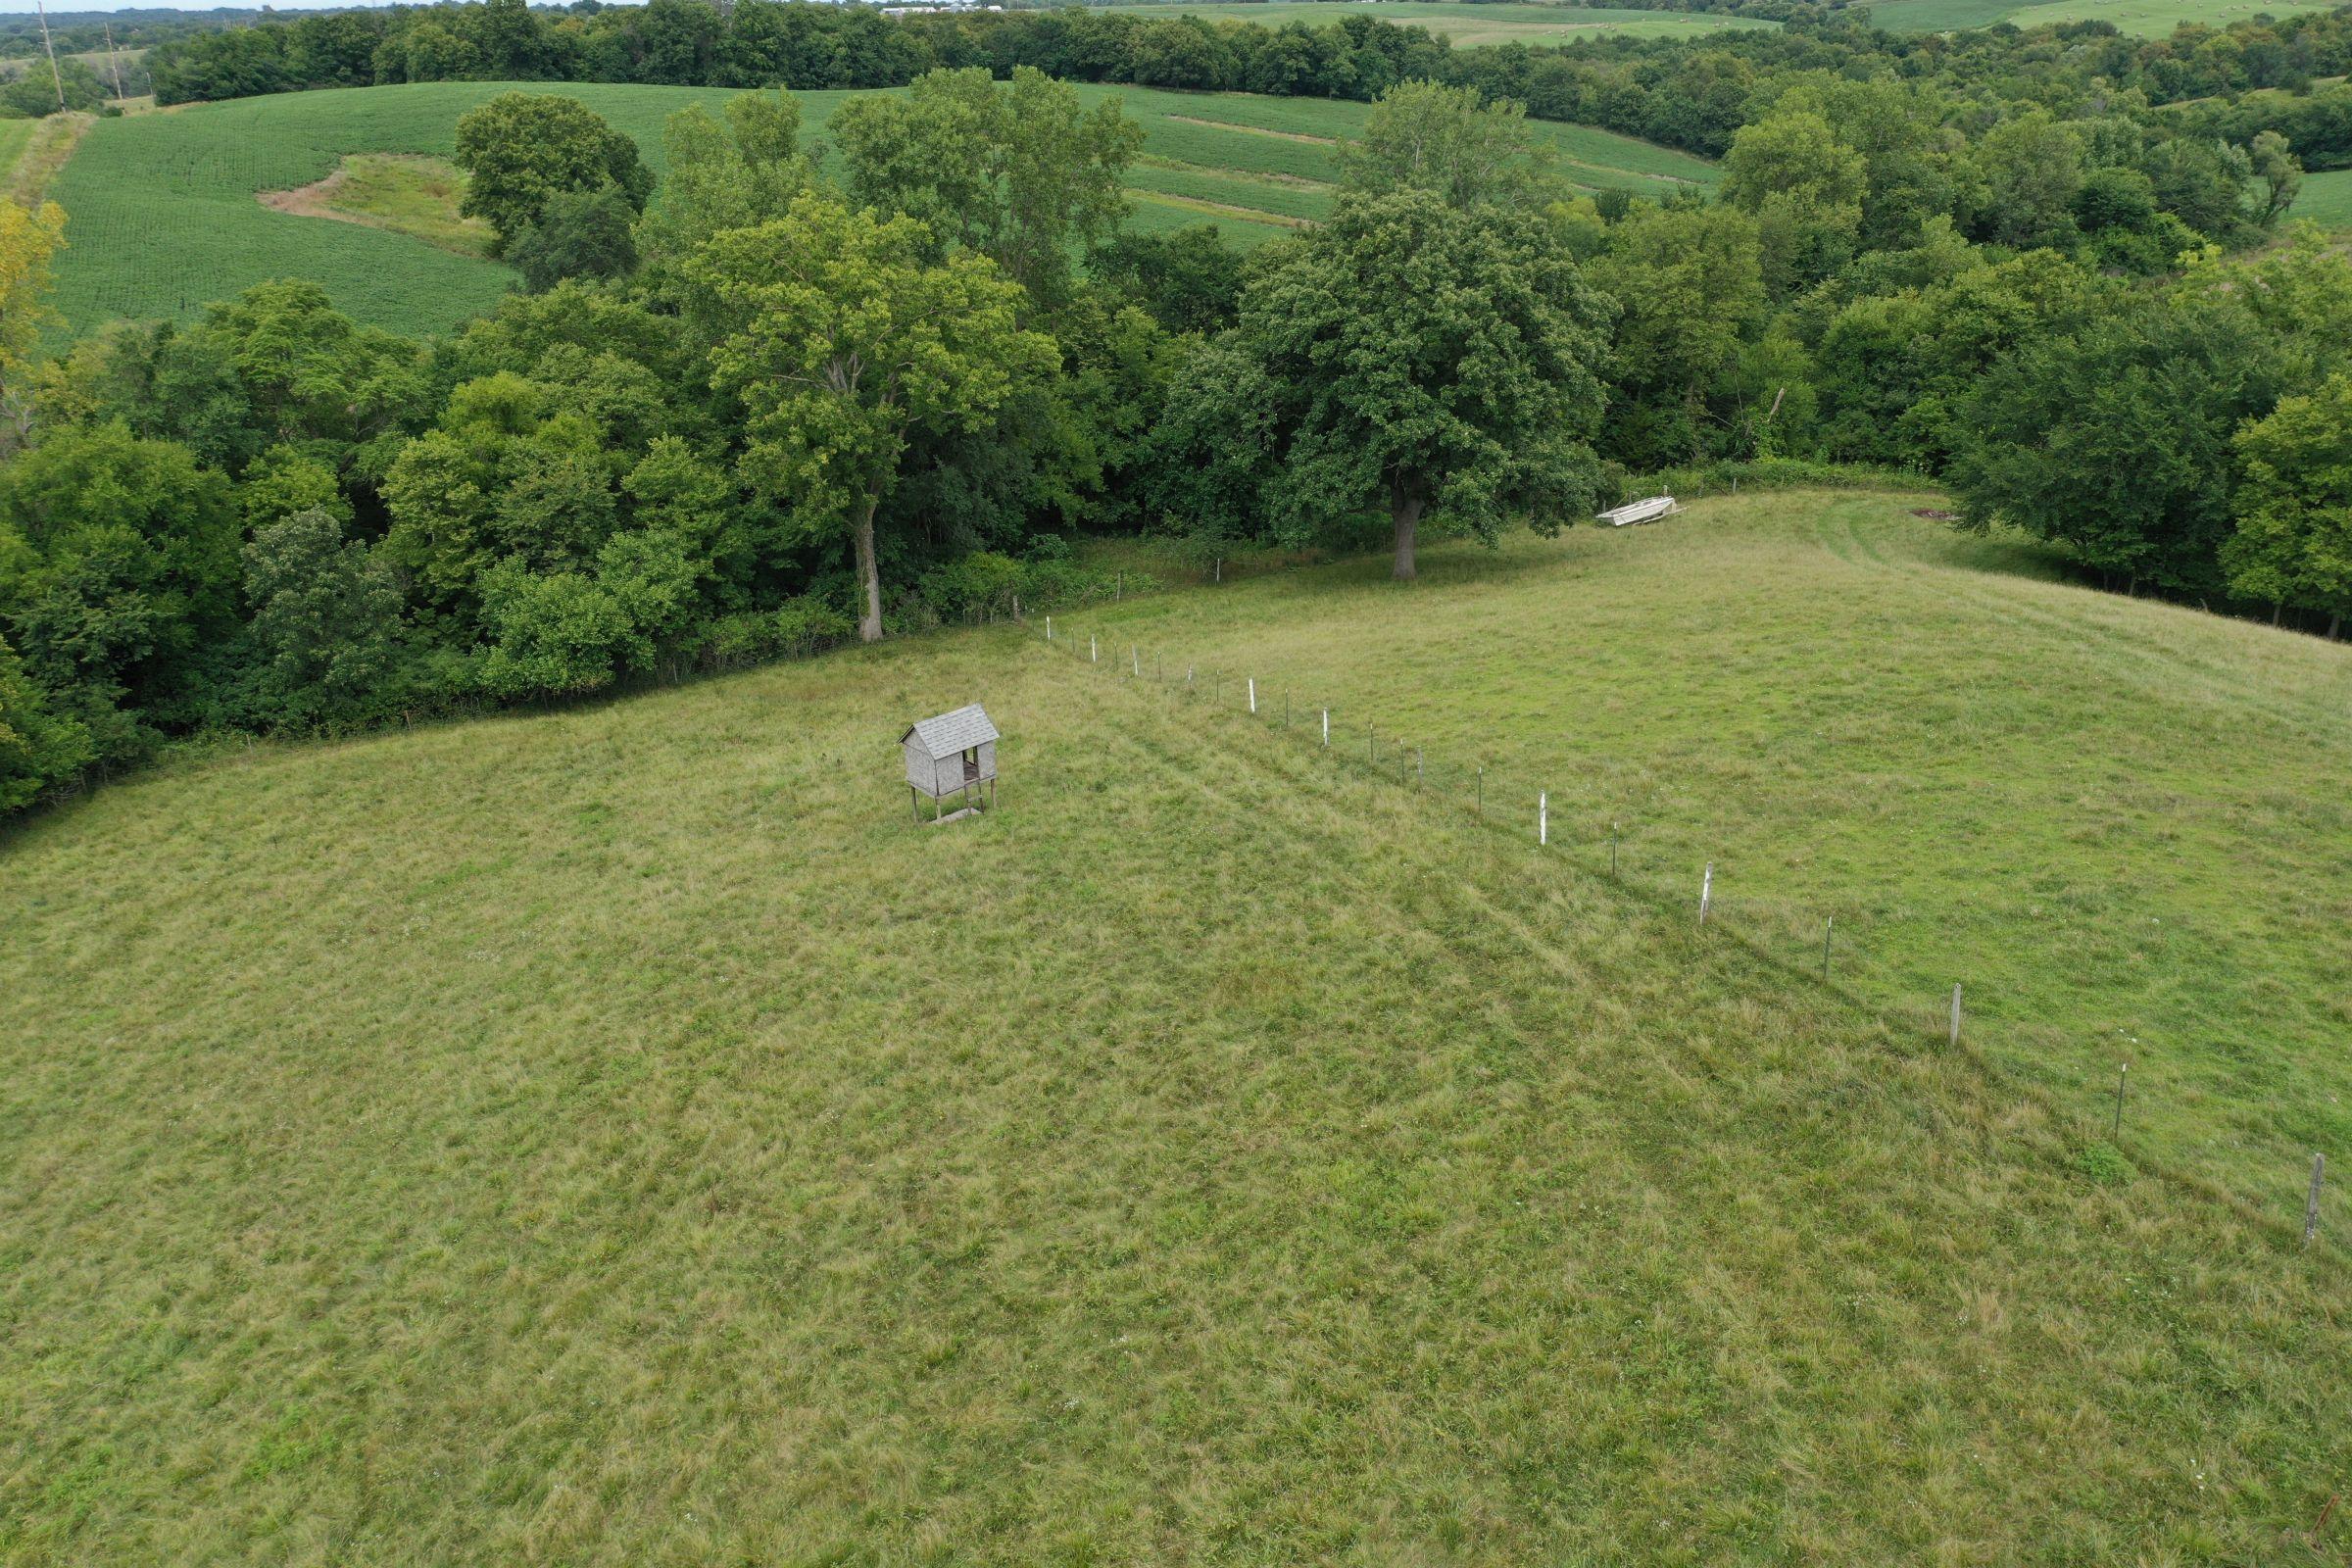 residential-warren-county-iowa-12-acres-listing-number-15104-0-2020-08-08-185047.jpg